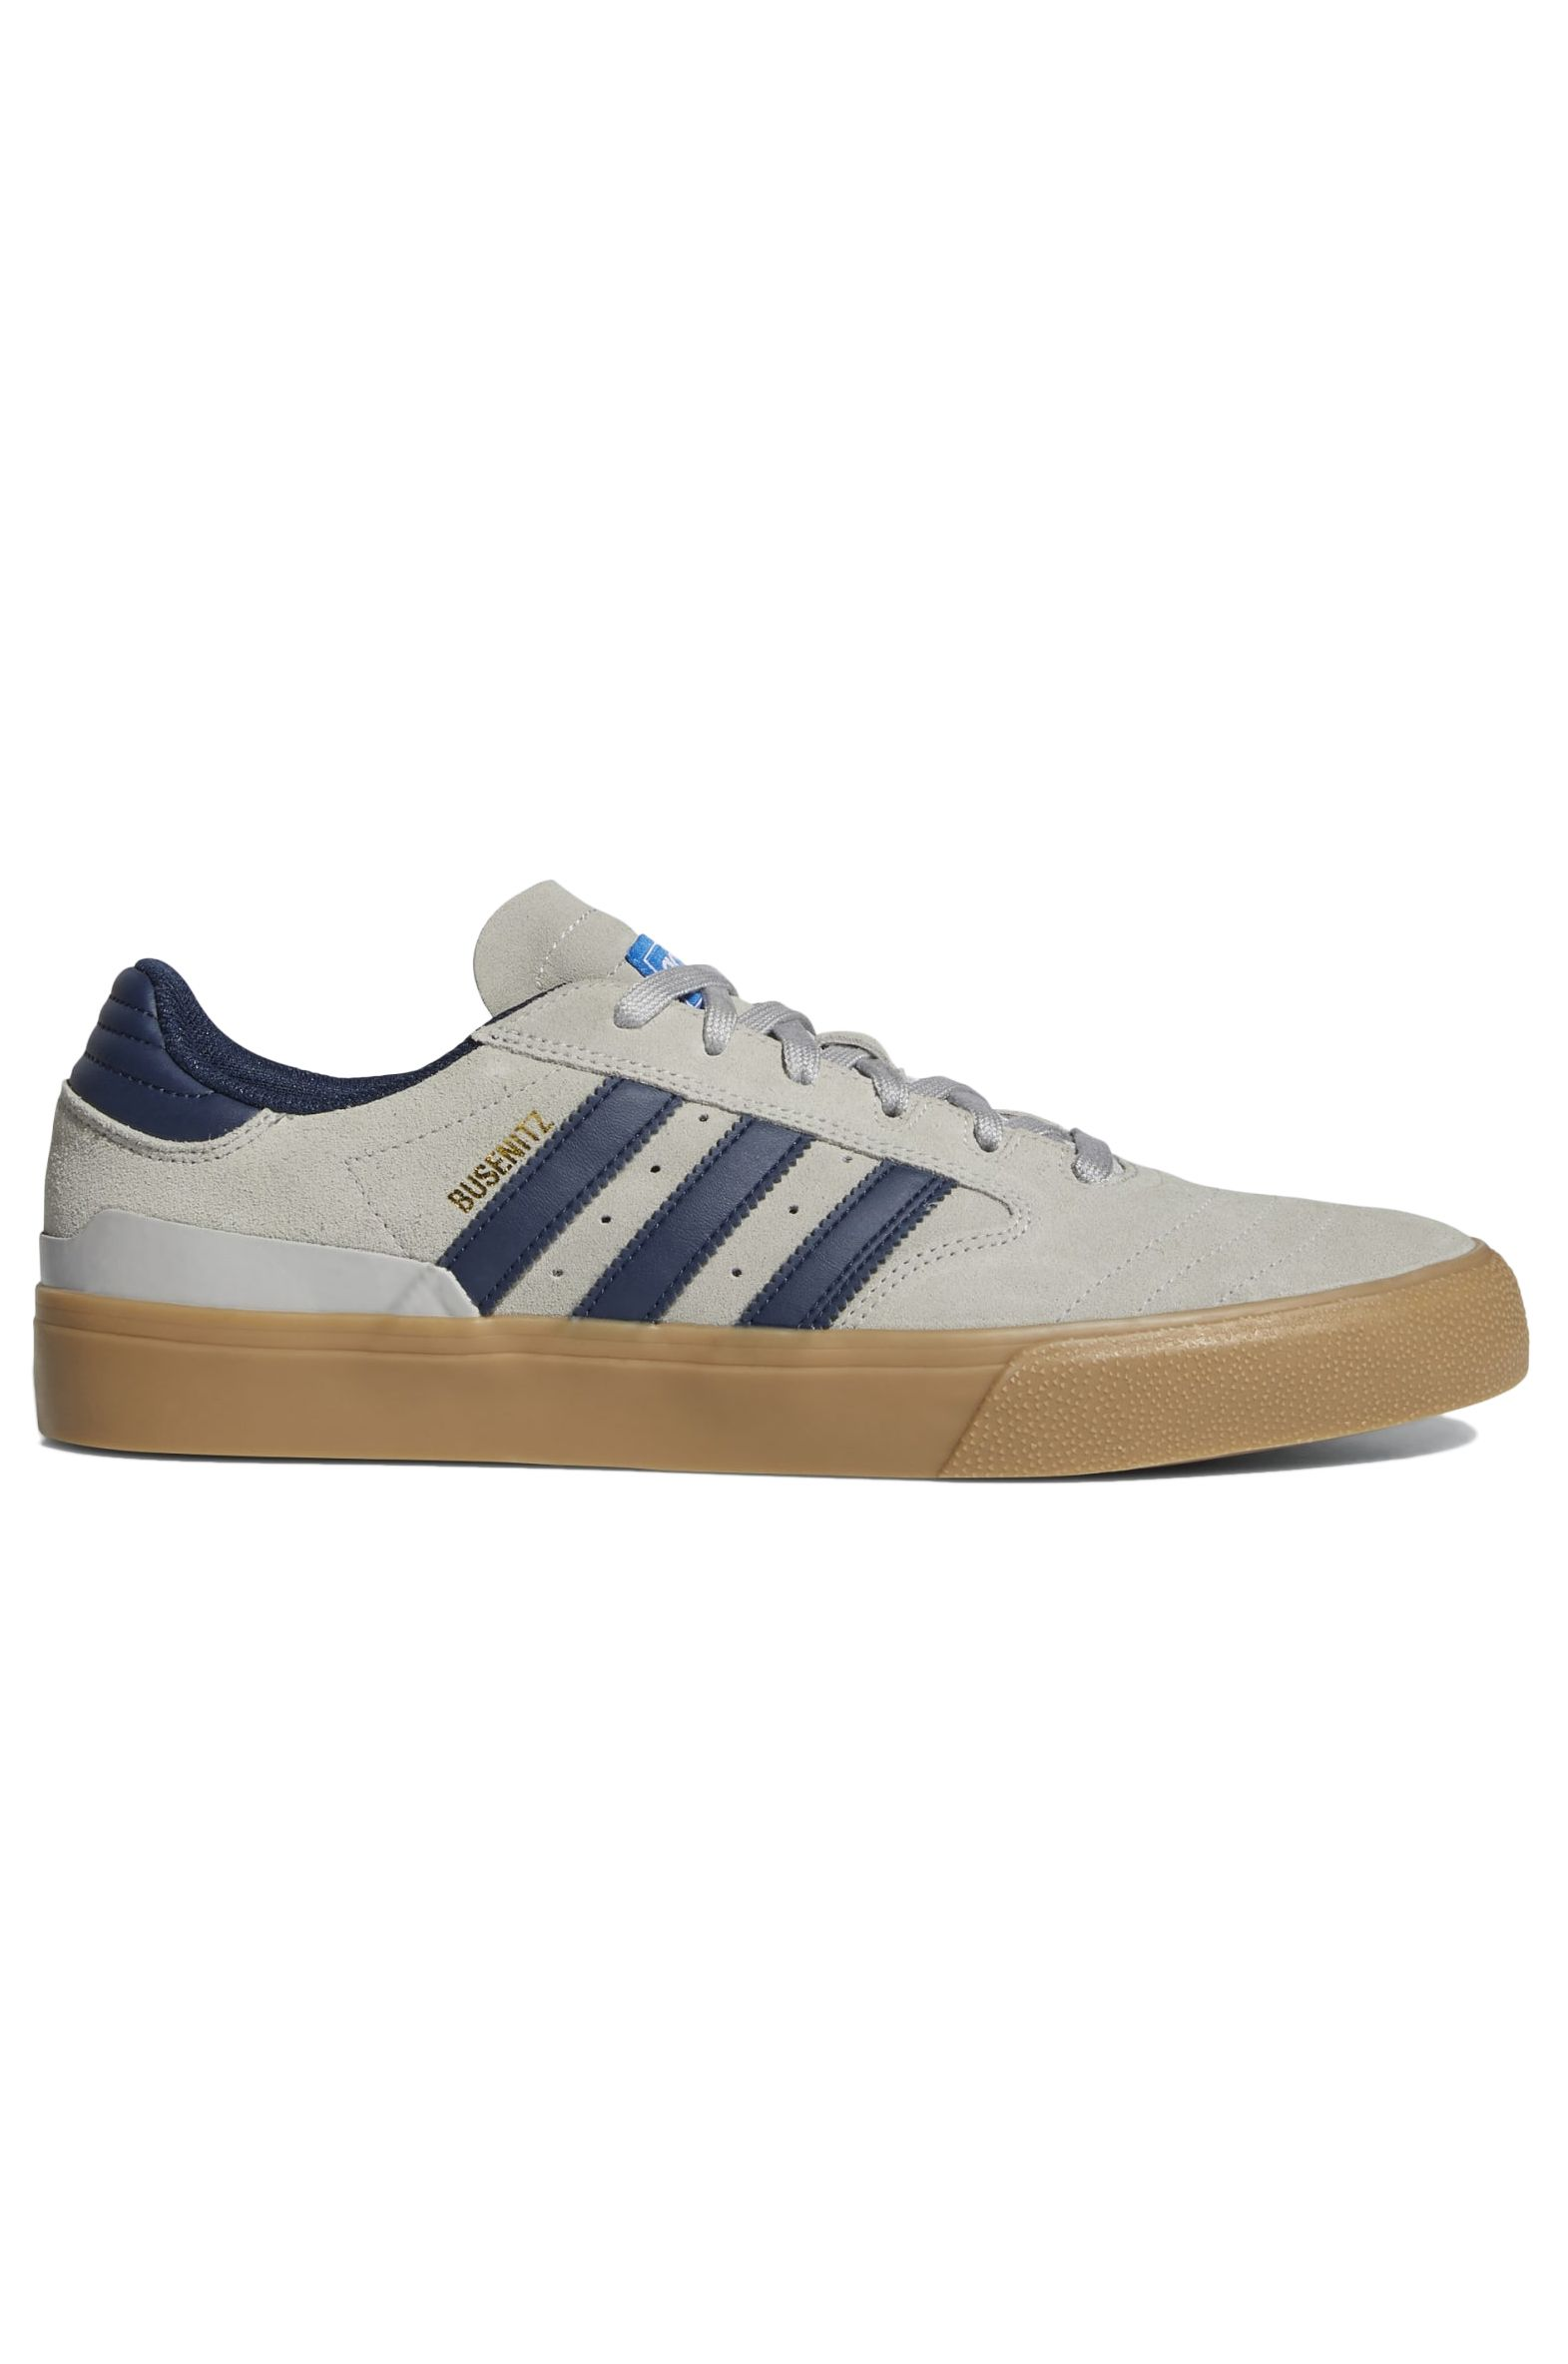 Adidas Shoes BUSENITZ VULC II Grey Two/Collegiate Navy/Gum4